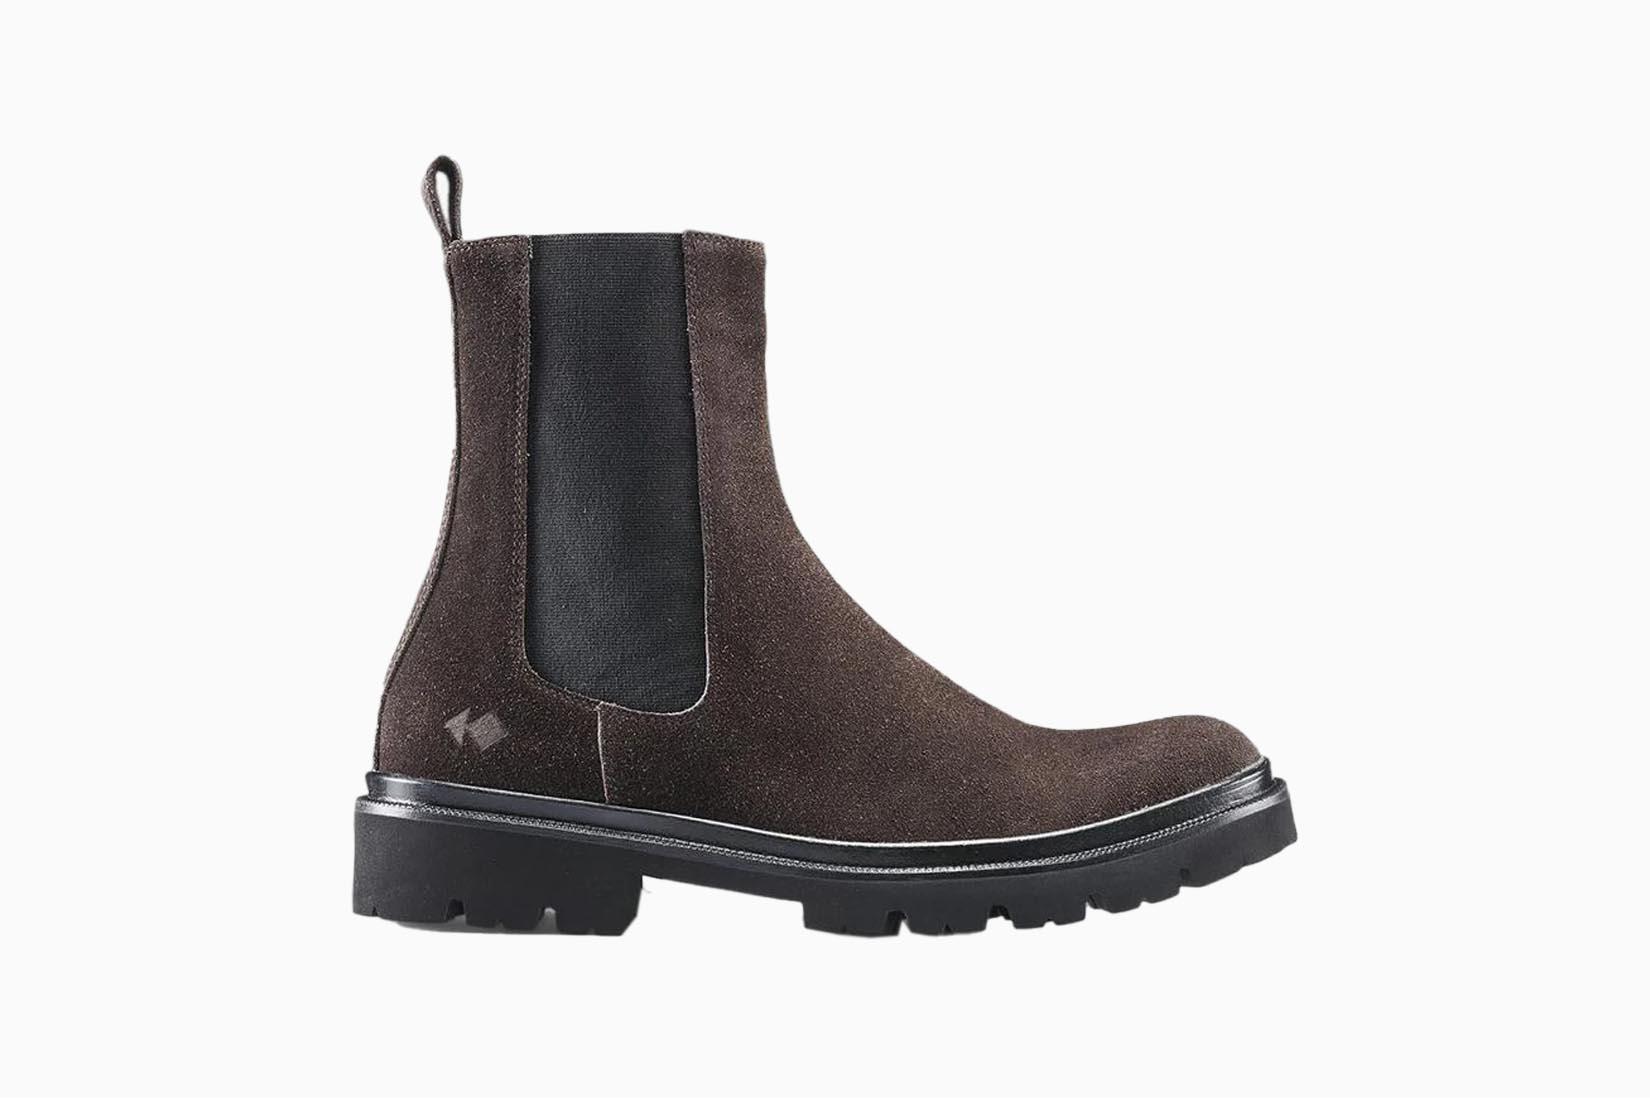 best boots men koio chelsea review Luxe Digital